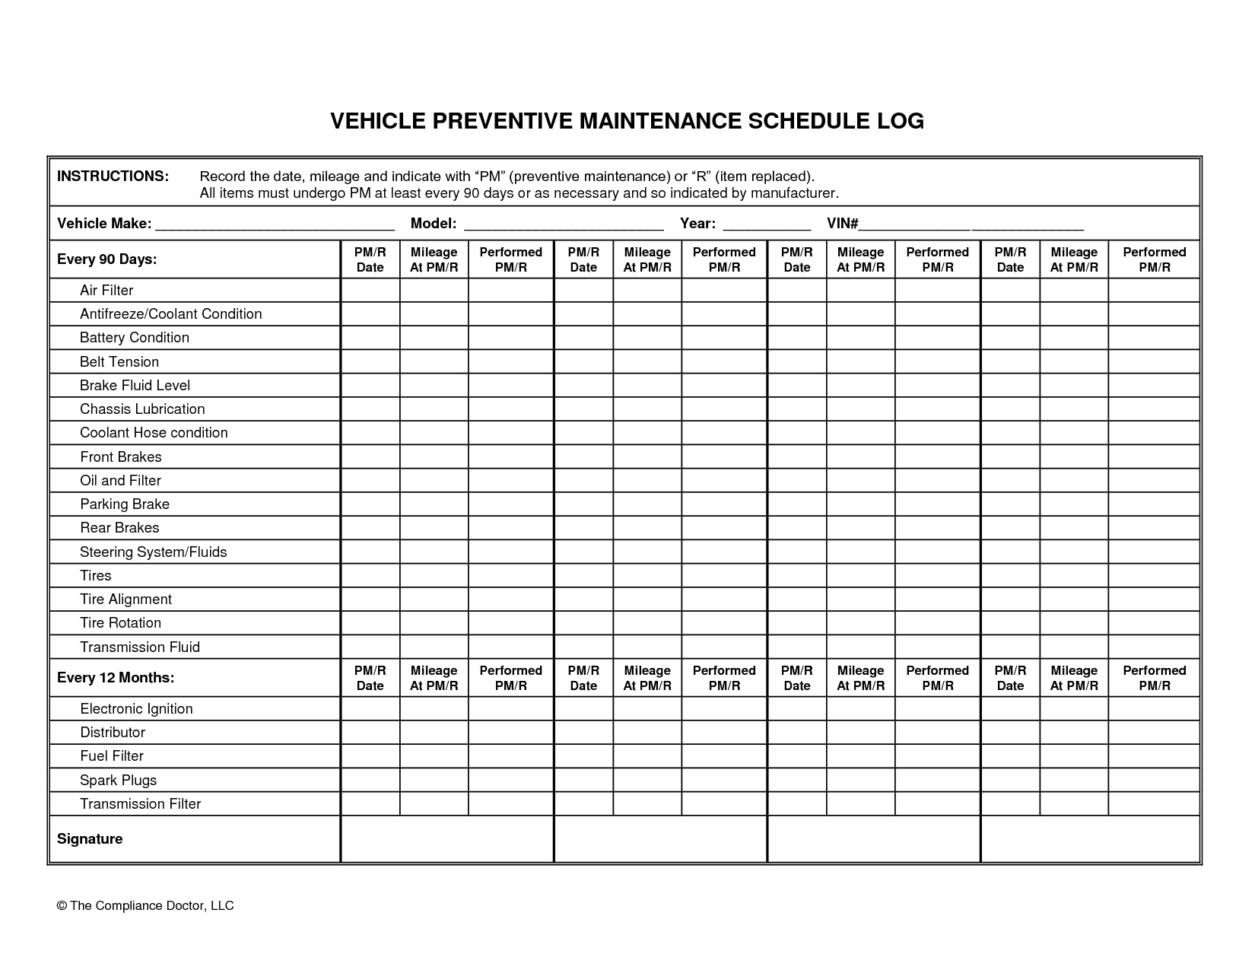 Preventive Maintenance Spreadsheet Template Throughout Spreadsheet Example Of Preventive Maintenance Uncategorized